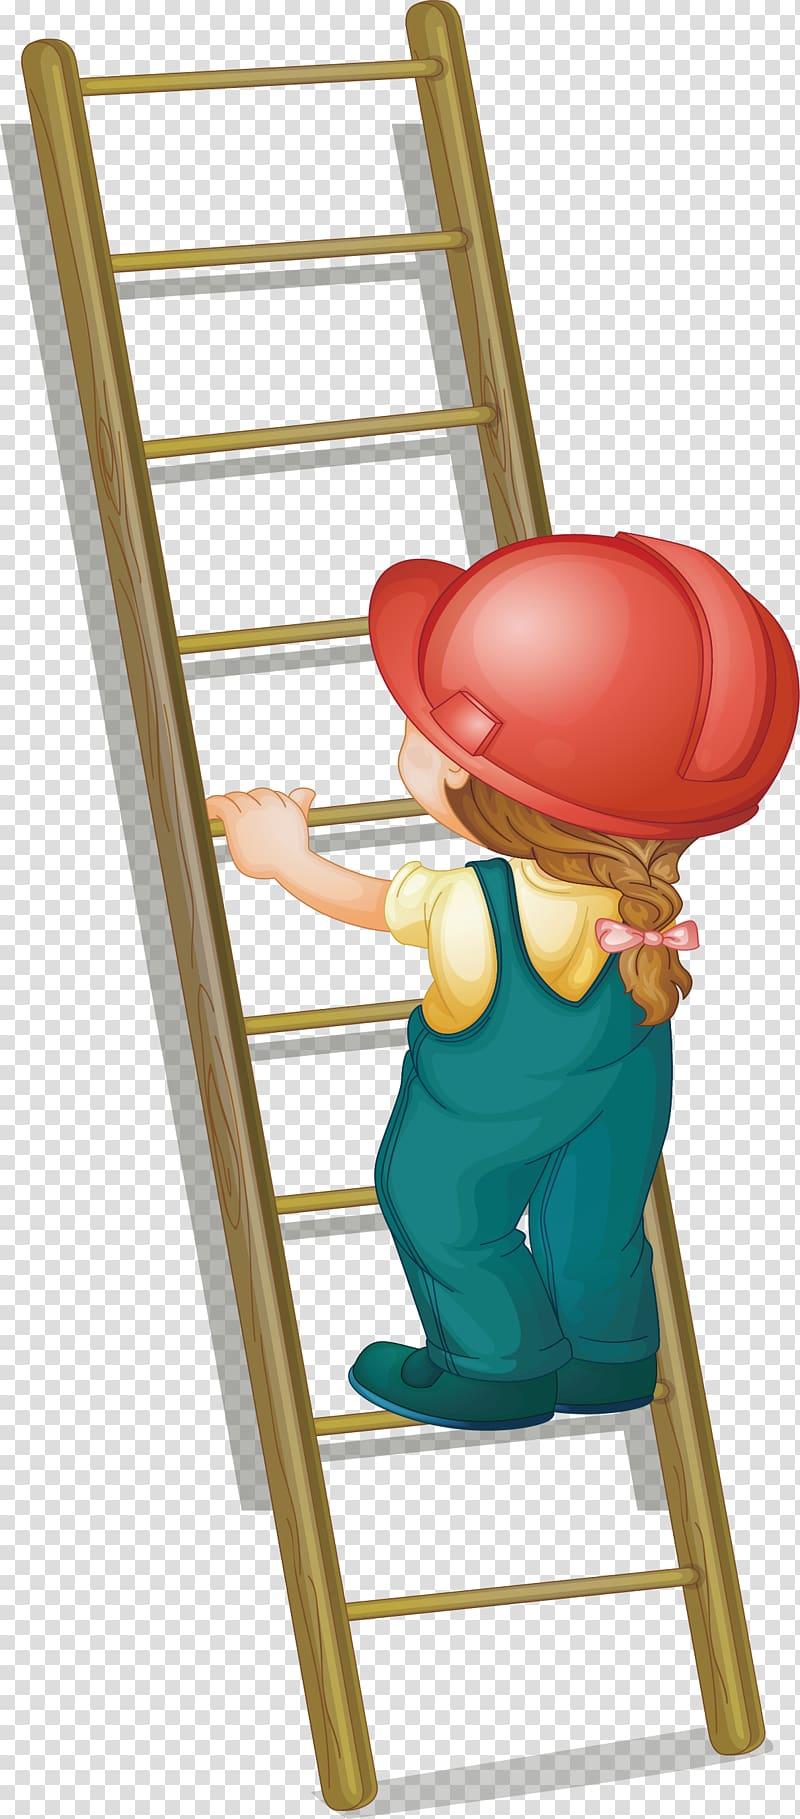 Ladder clipart kid. Illustration step on the